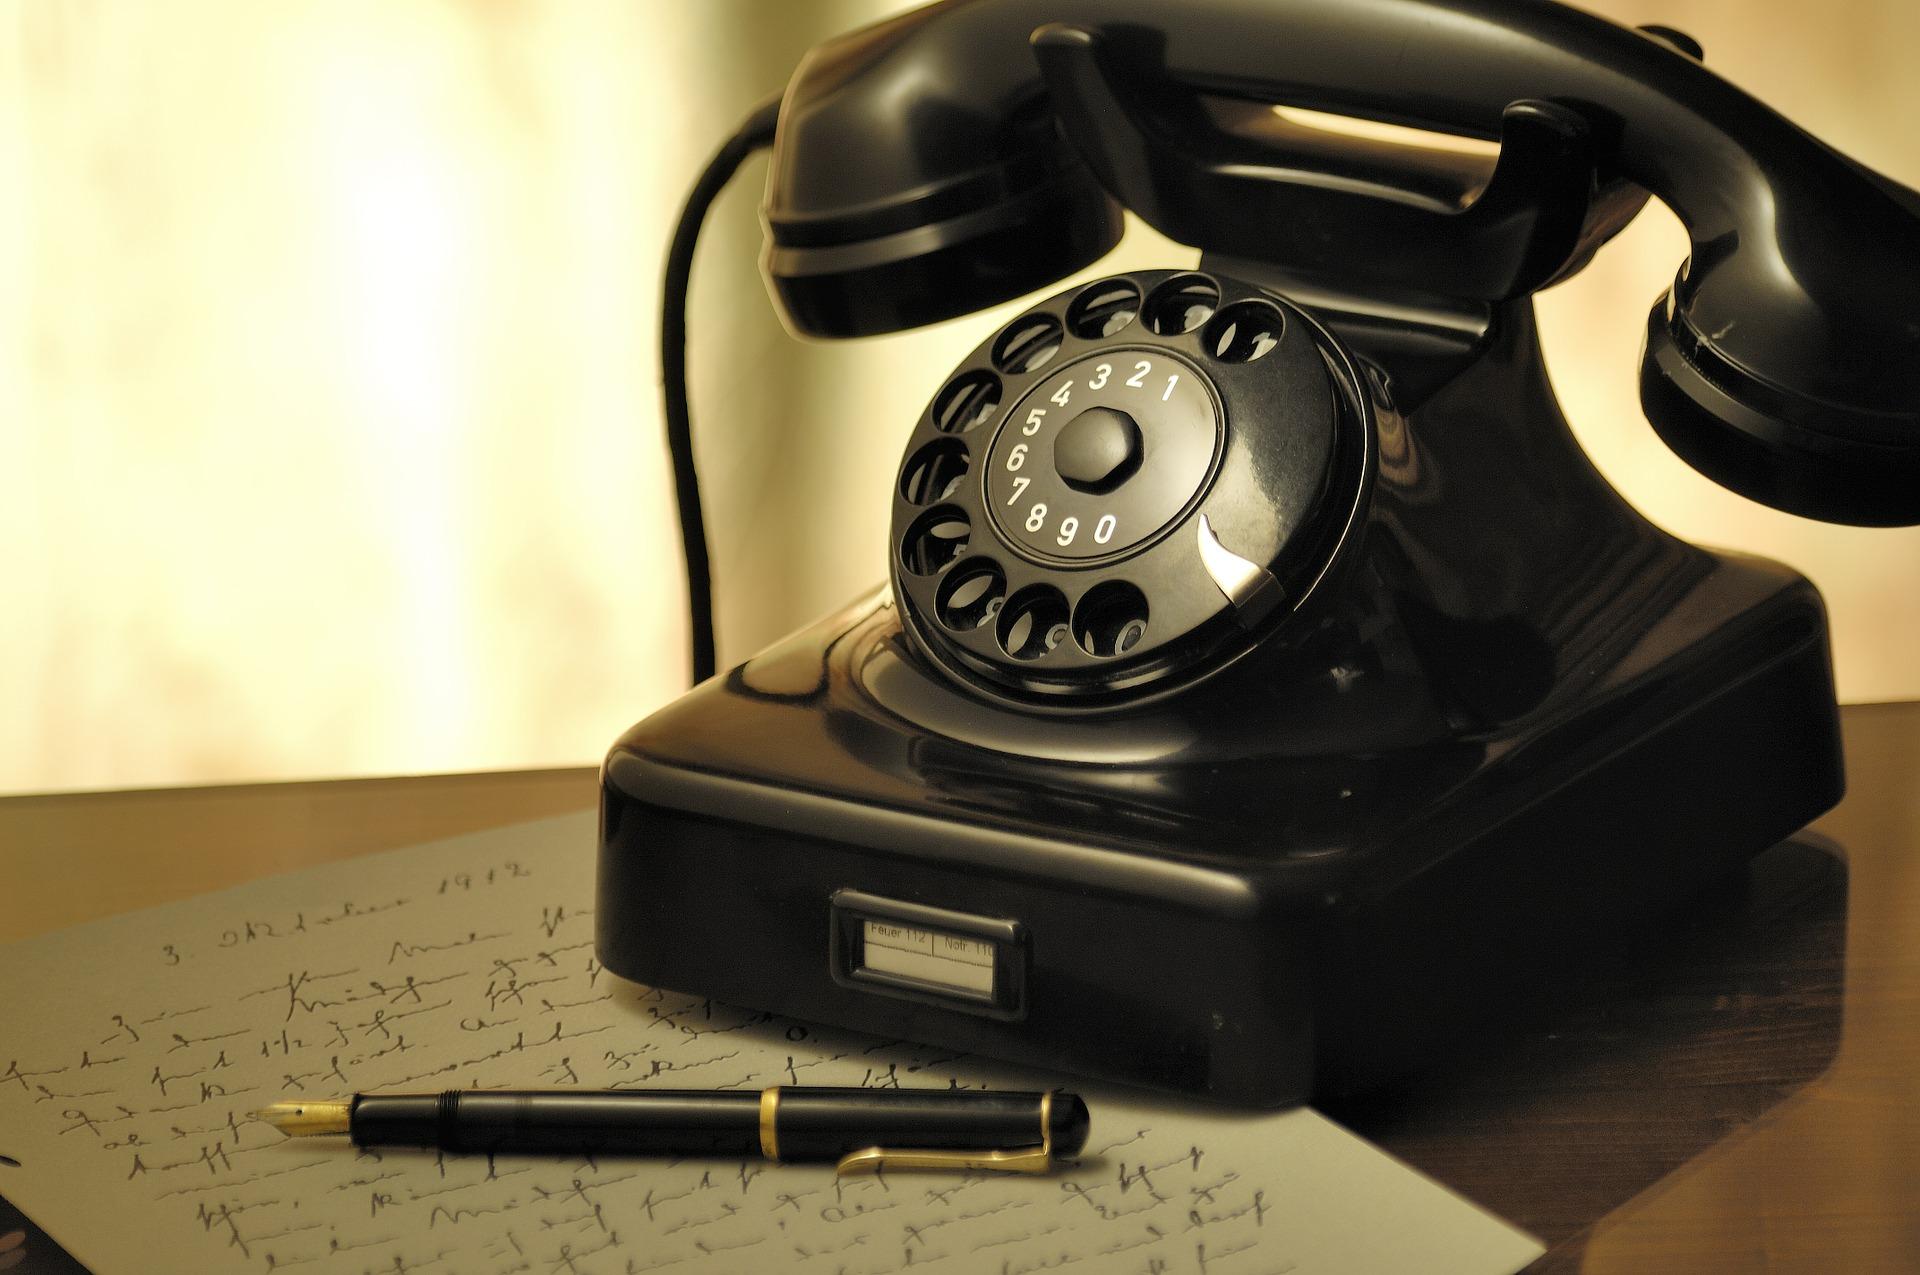 telephone, phone